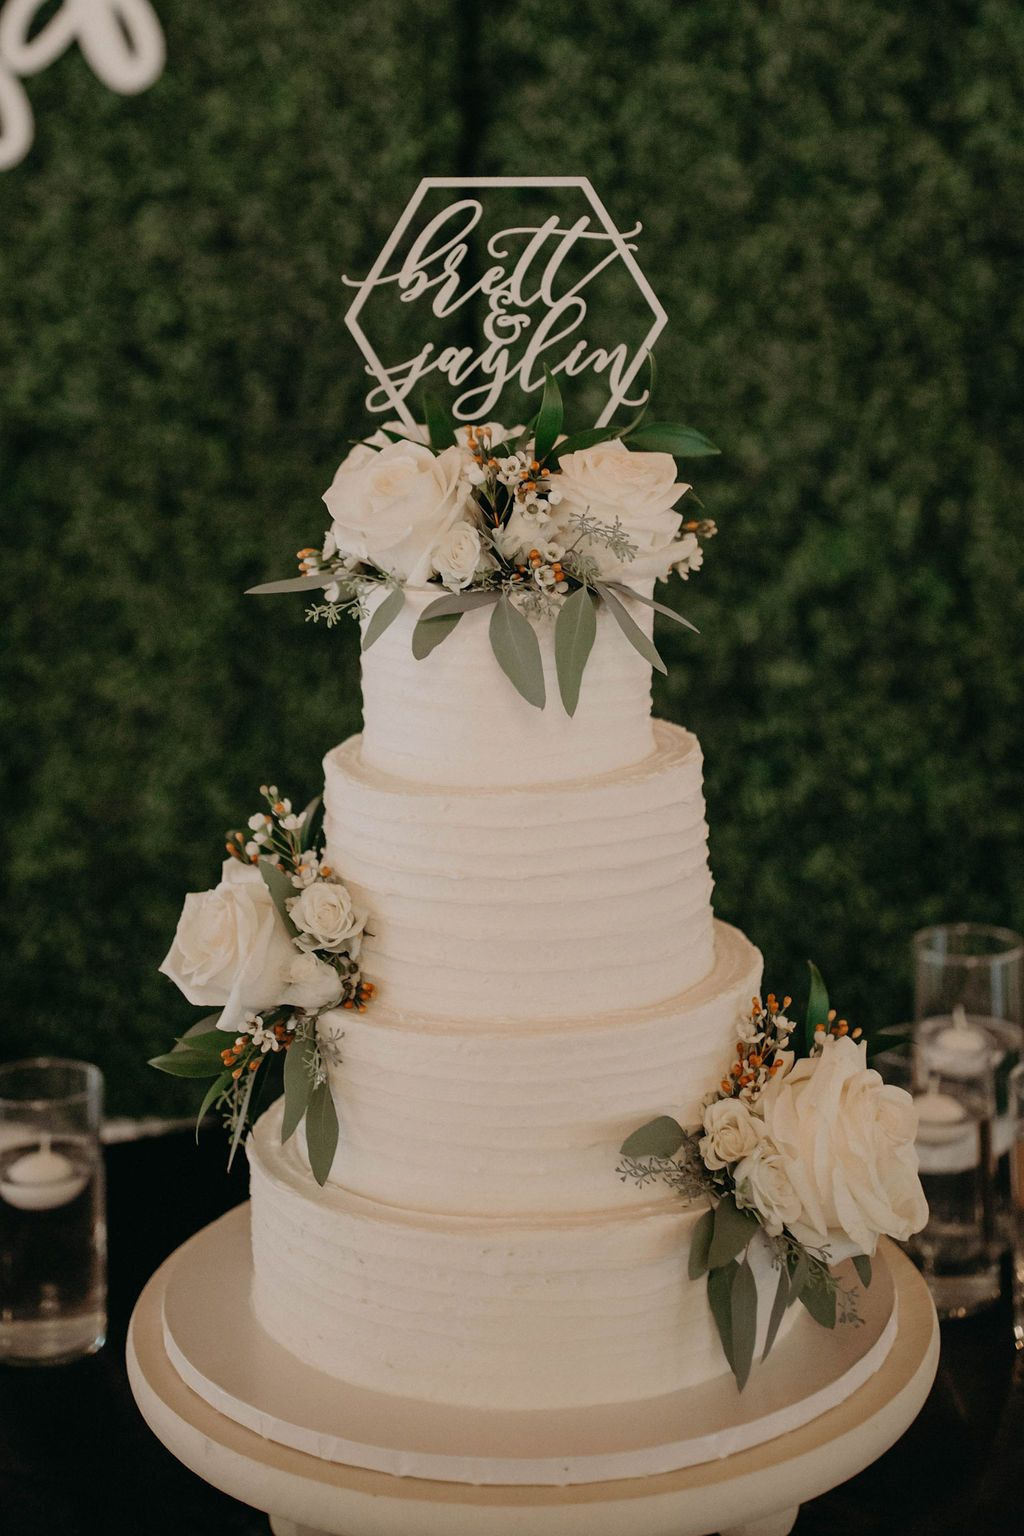 Stonebrook Hall Wedding Venue - The Springs Events